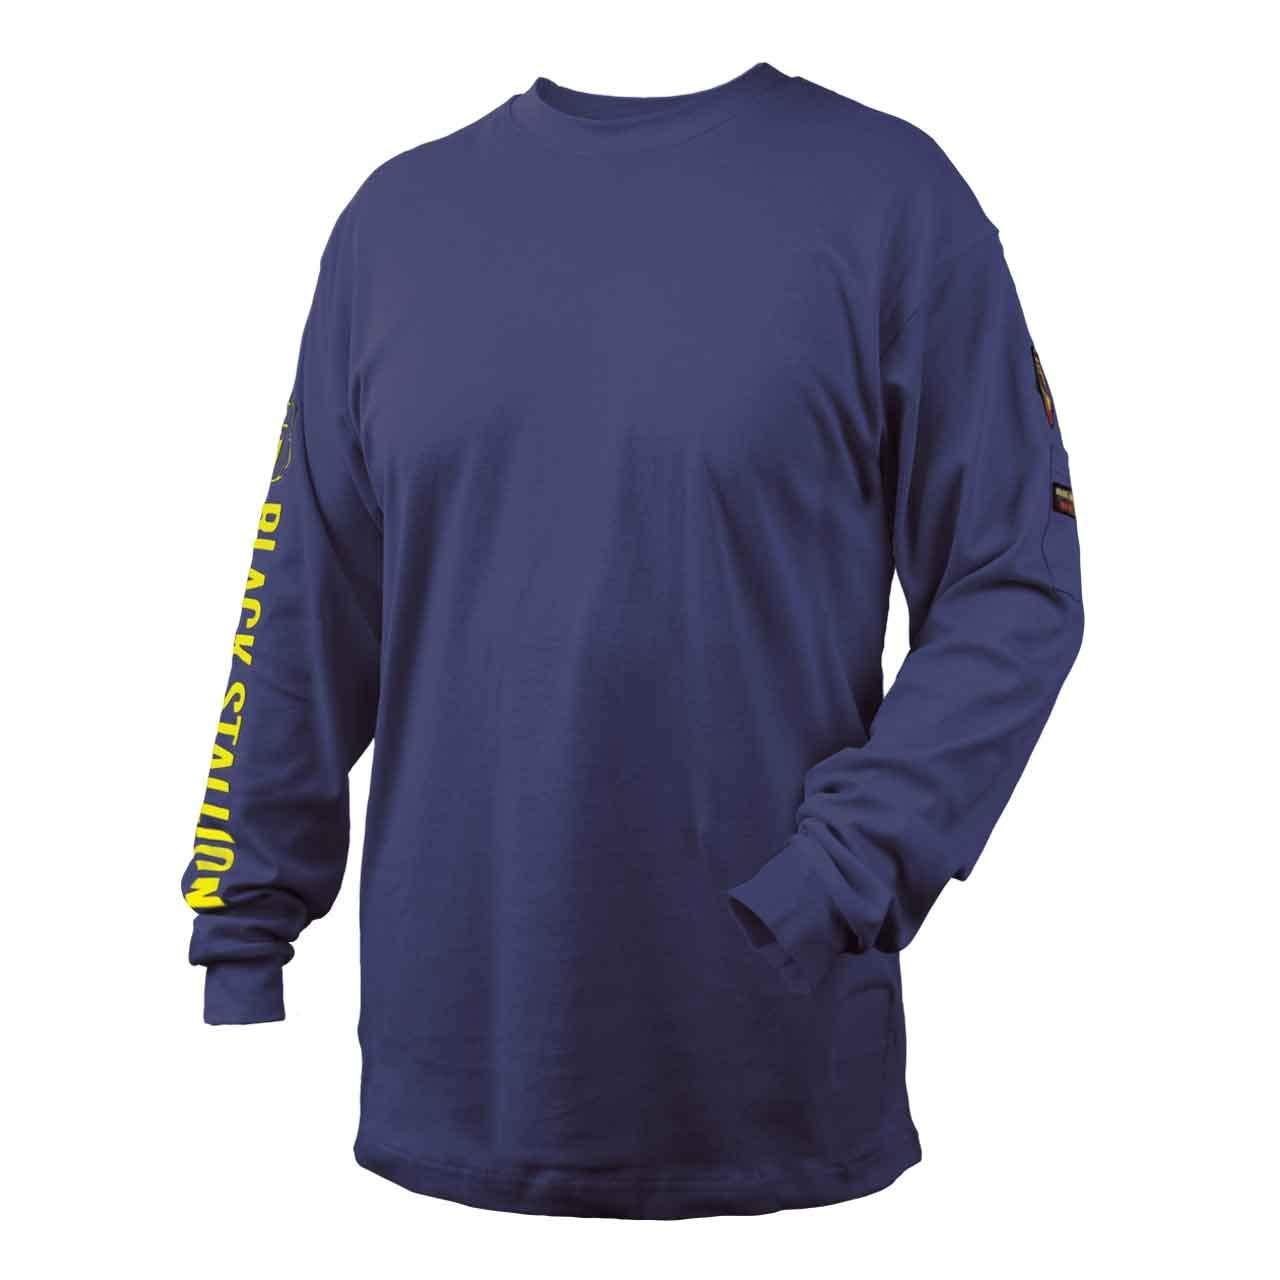 Black Stallion TF2510-NV NFPA 2112 & NFPA70E FR Cotton Knit Long-Sleev